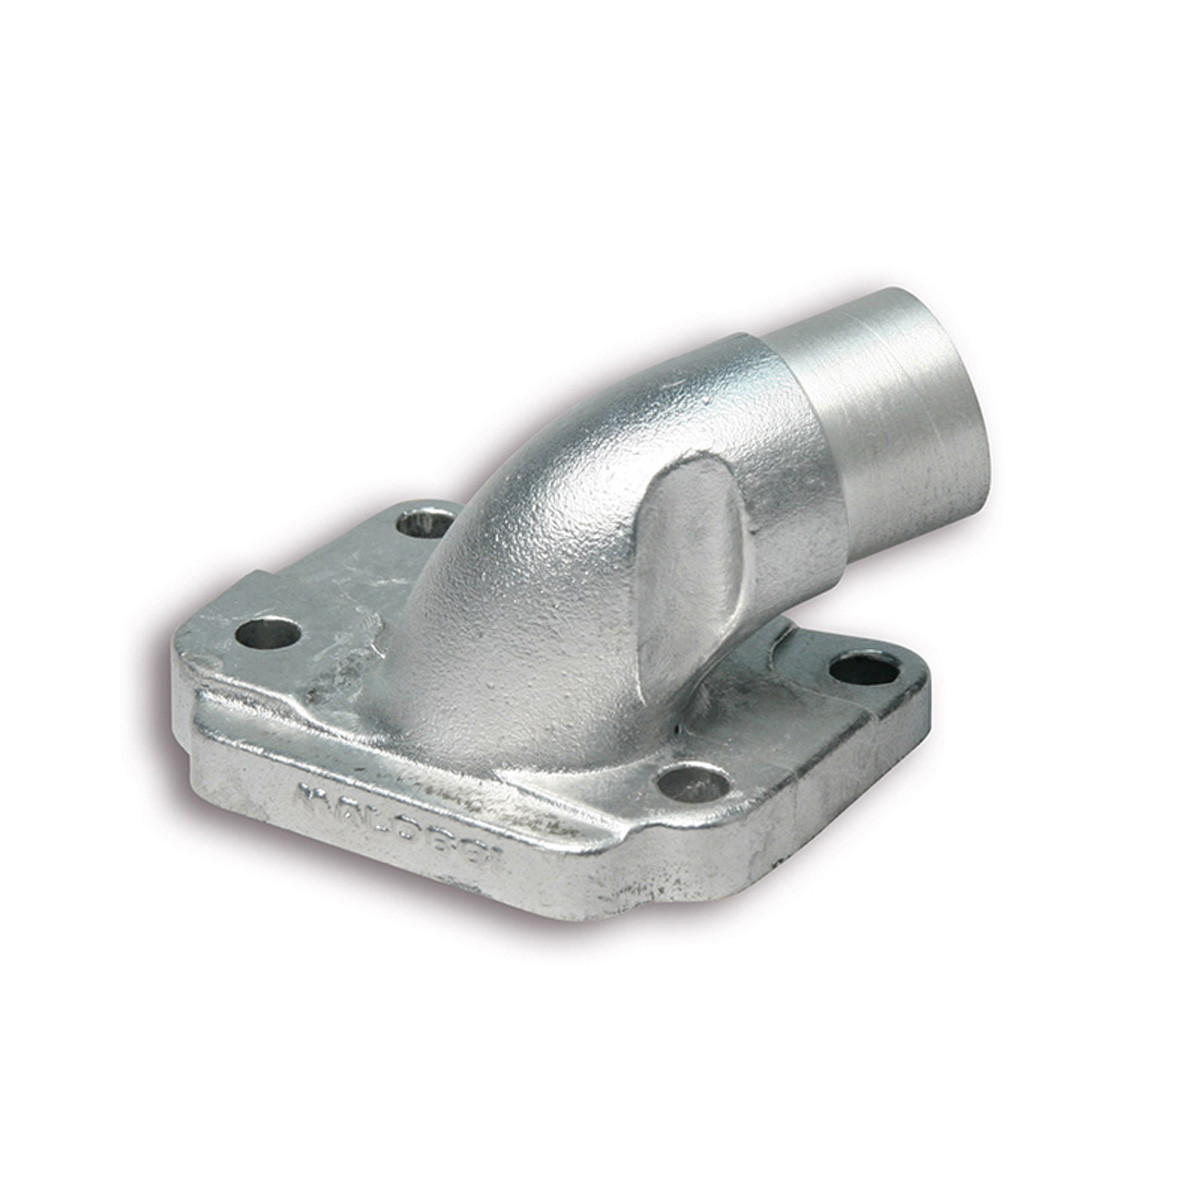 Pipe Admission Honda Wallaroo - 17 / 19mm Malossi